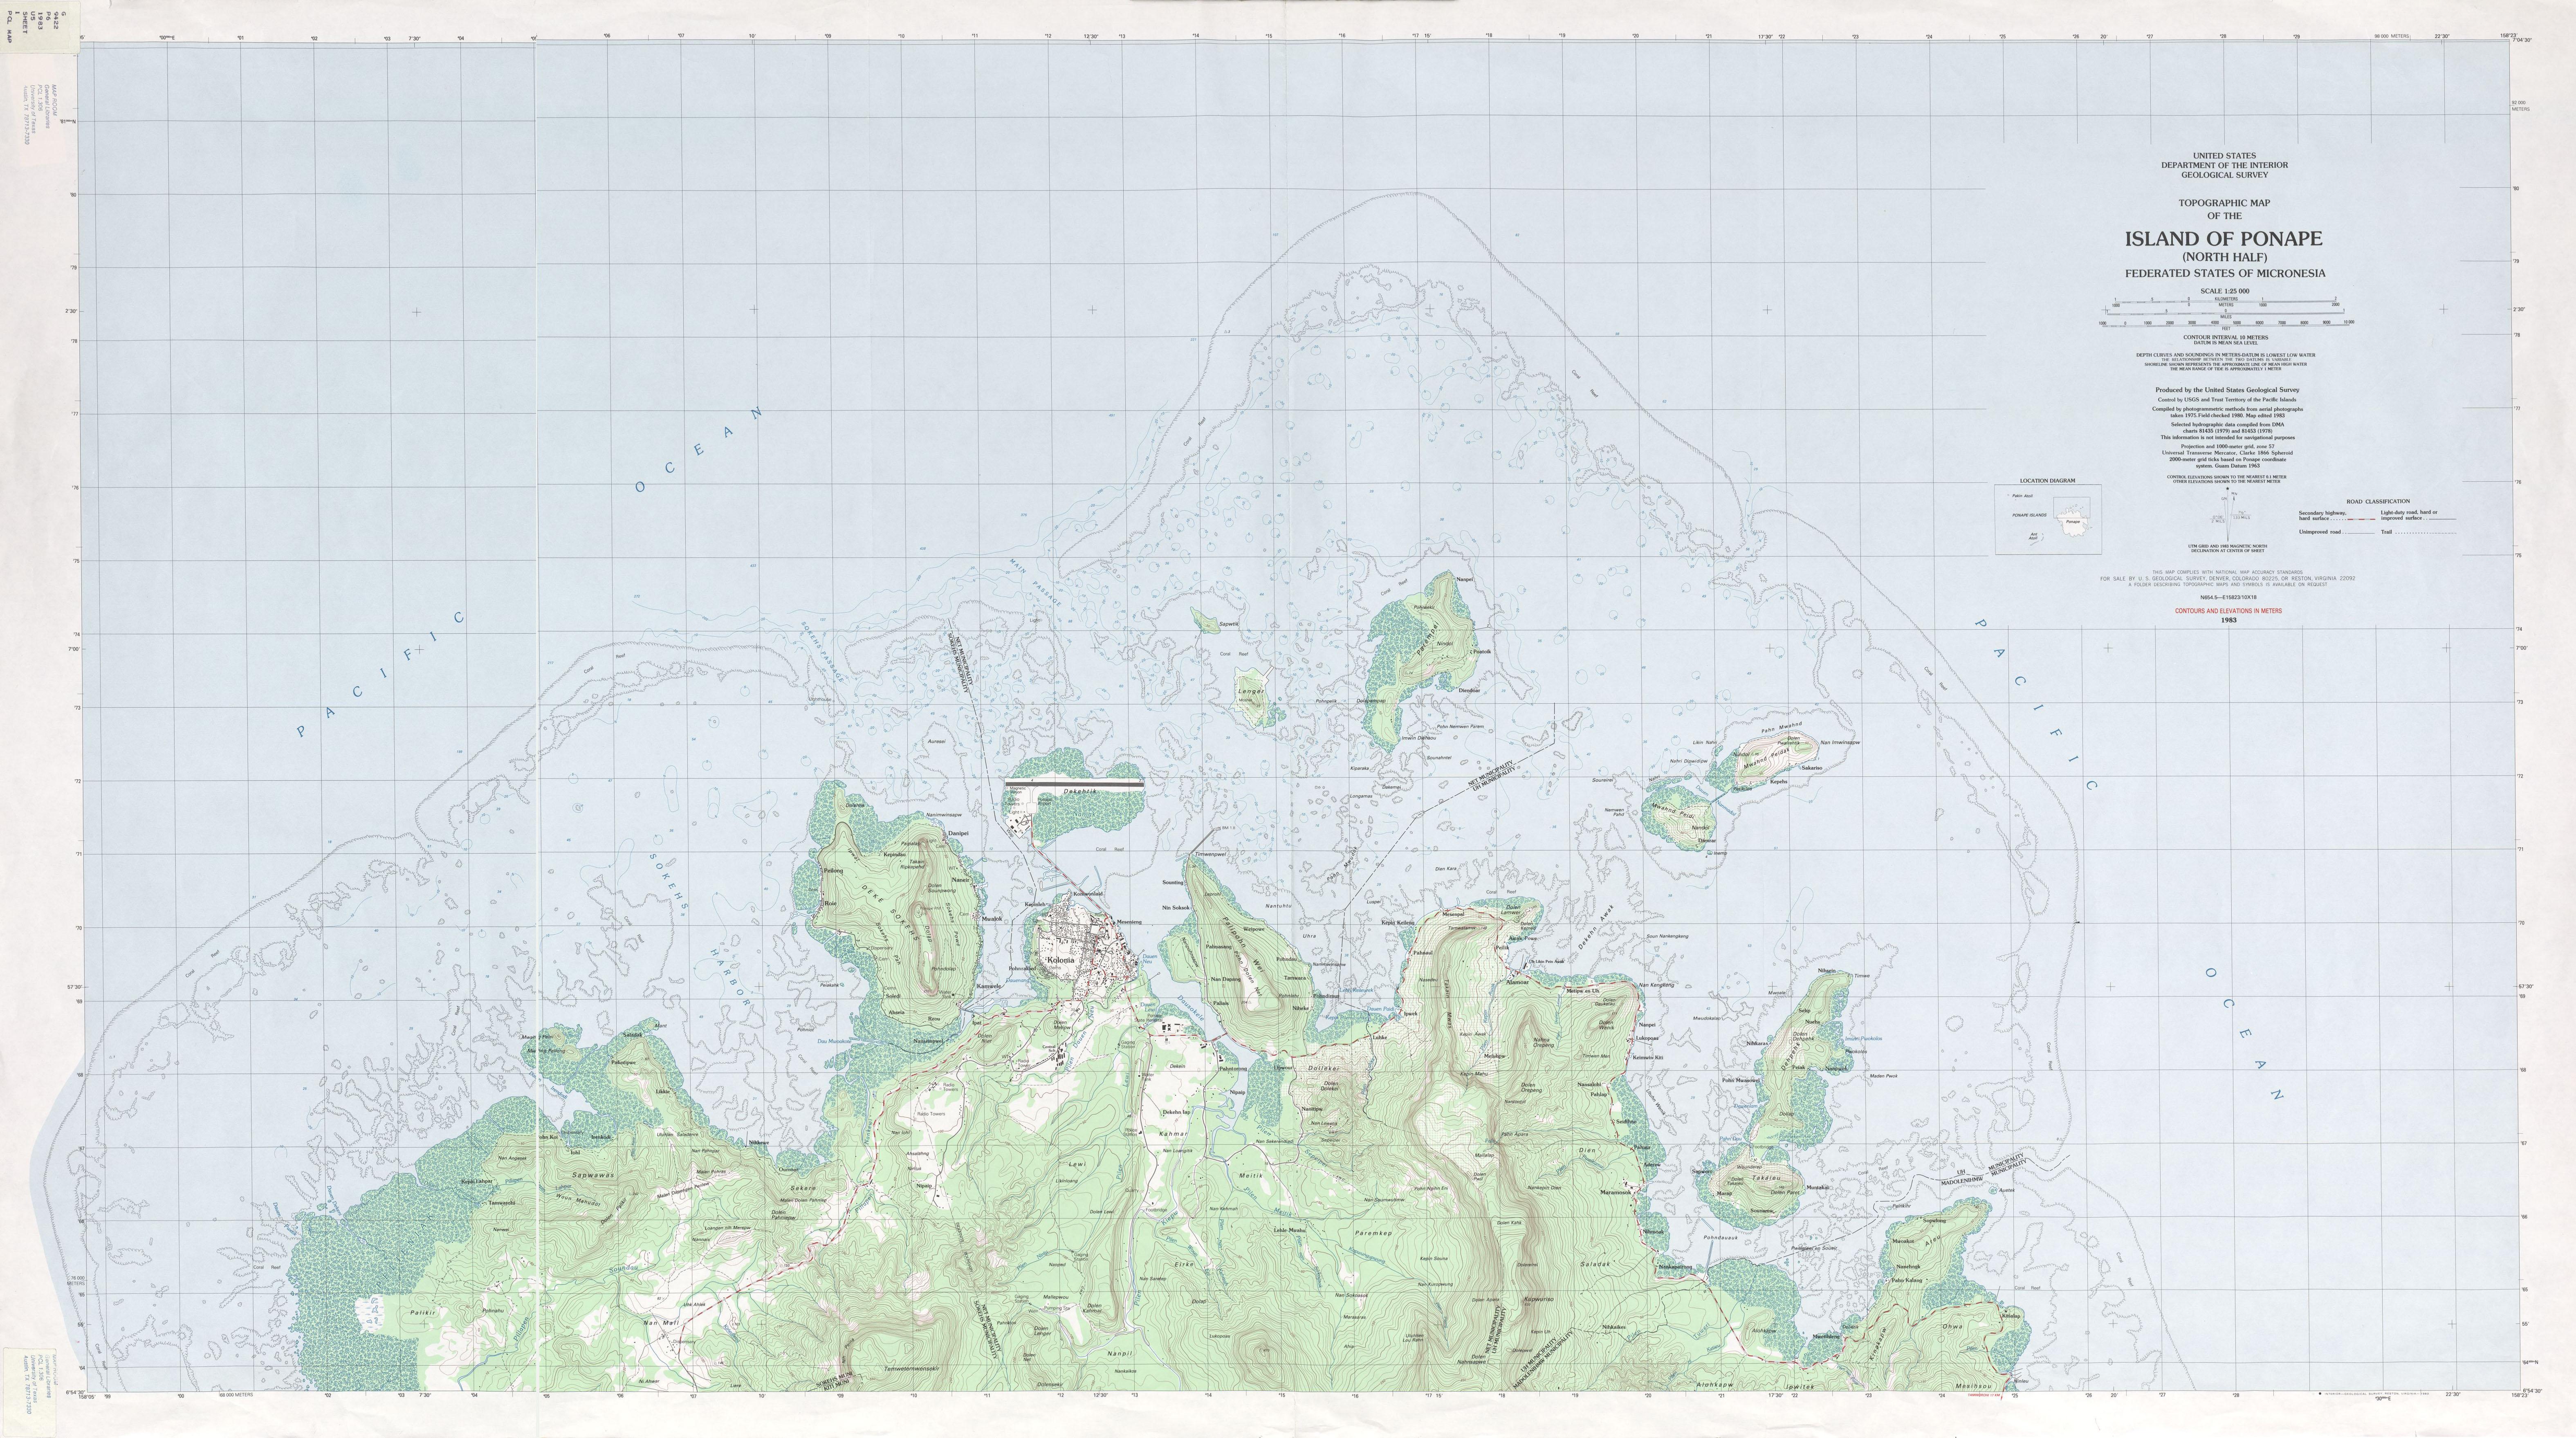 1 25 000 U S Geological Survey 1983 3 3 Mb